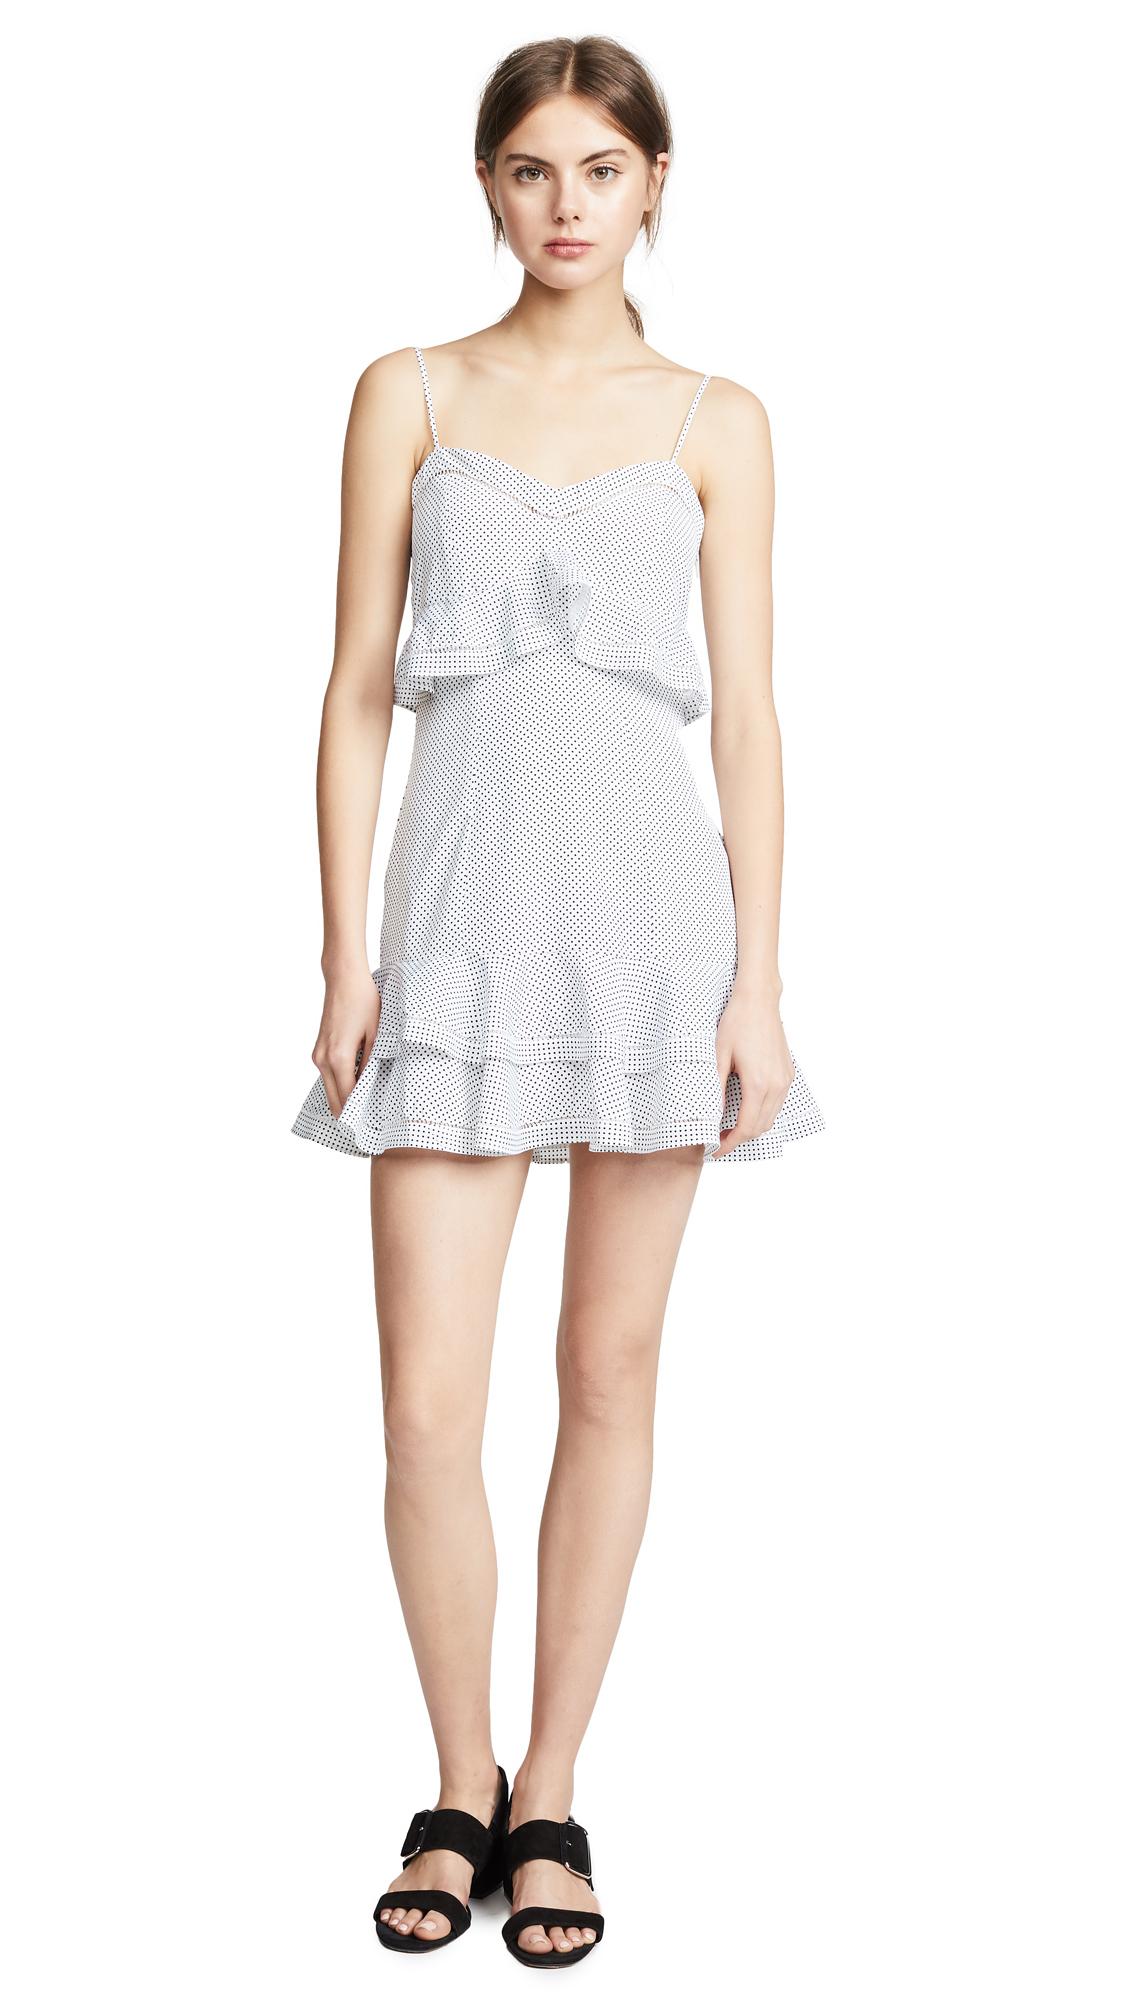 LIKELY Norah Dress